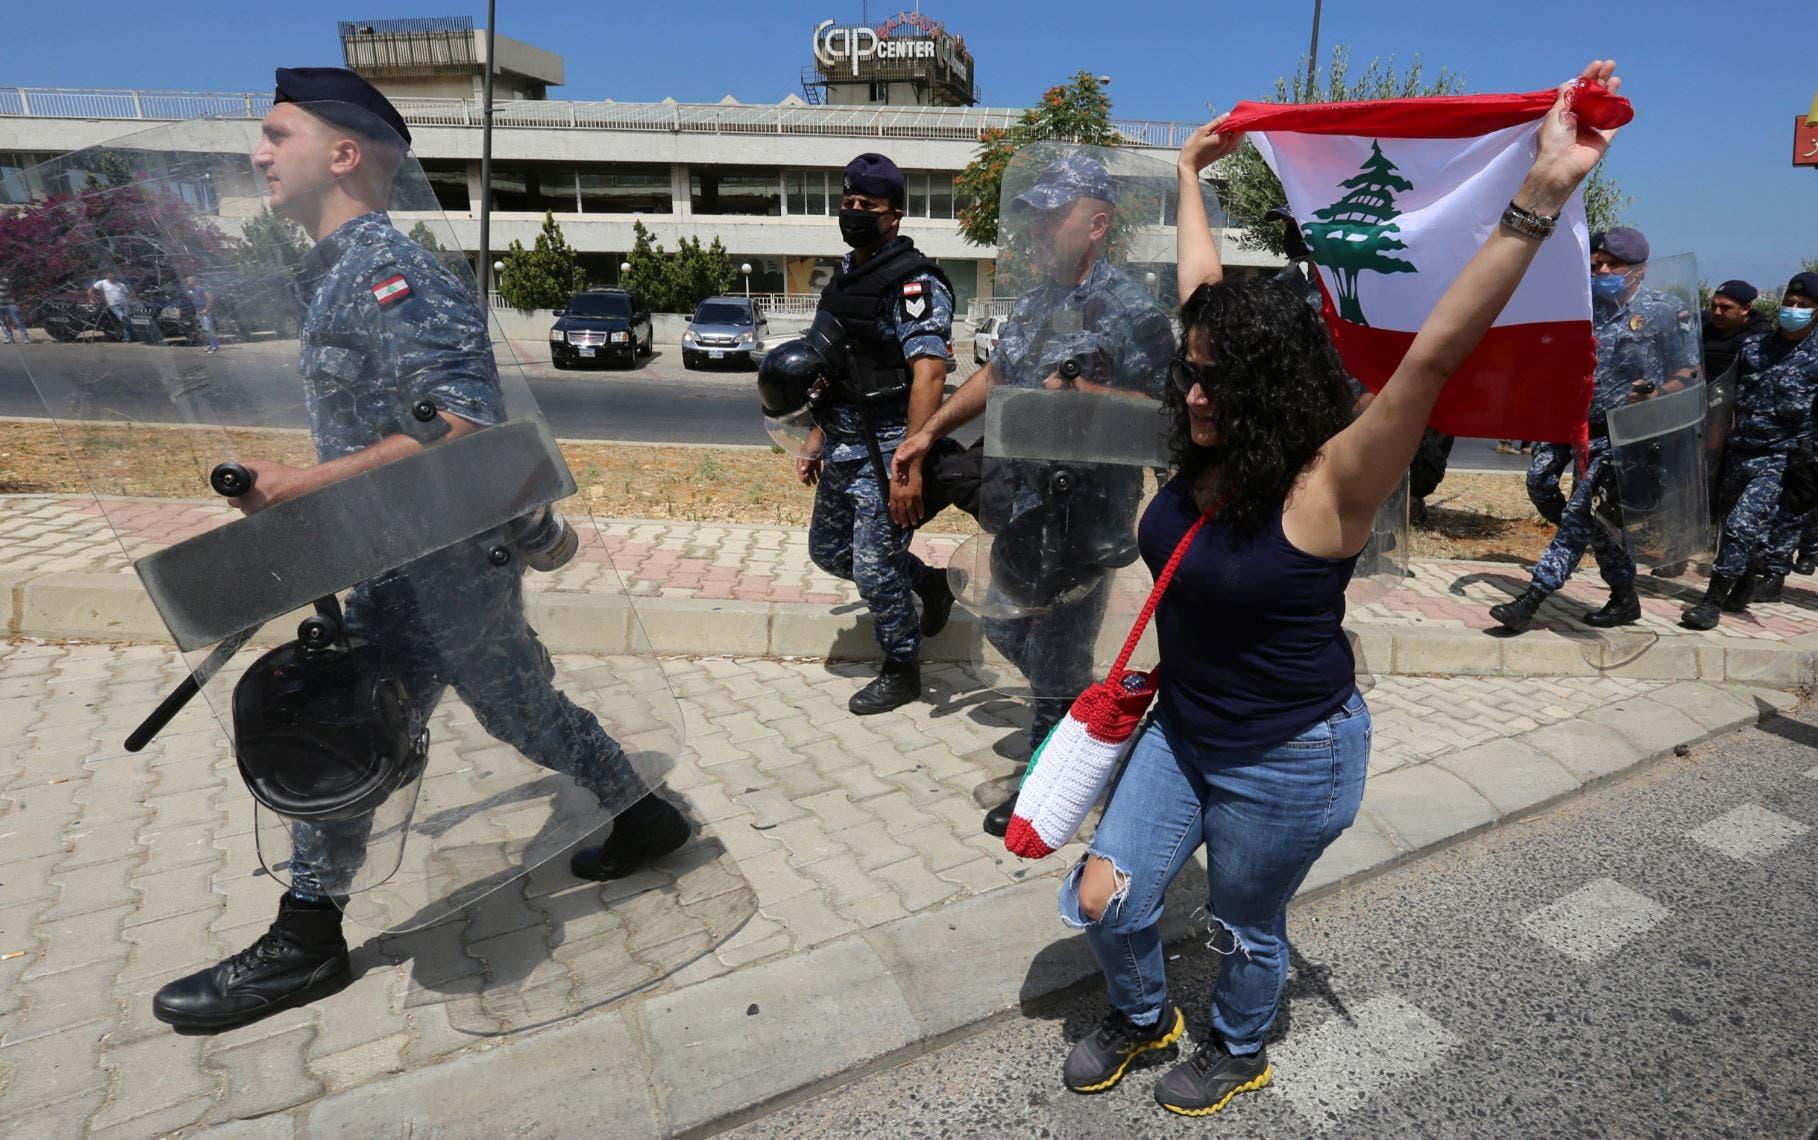 احتجاجات لبنان - رويترز ( 25 يونيو 2020)